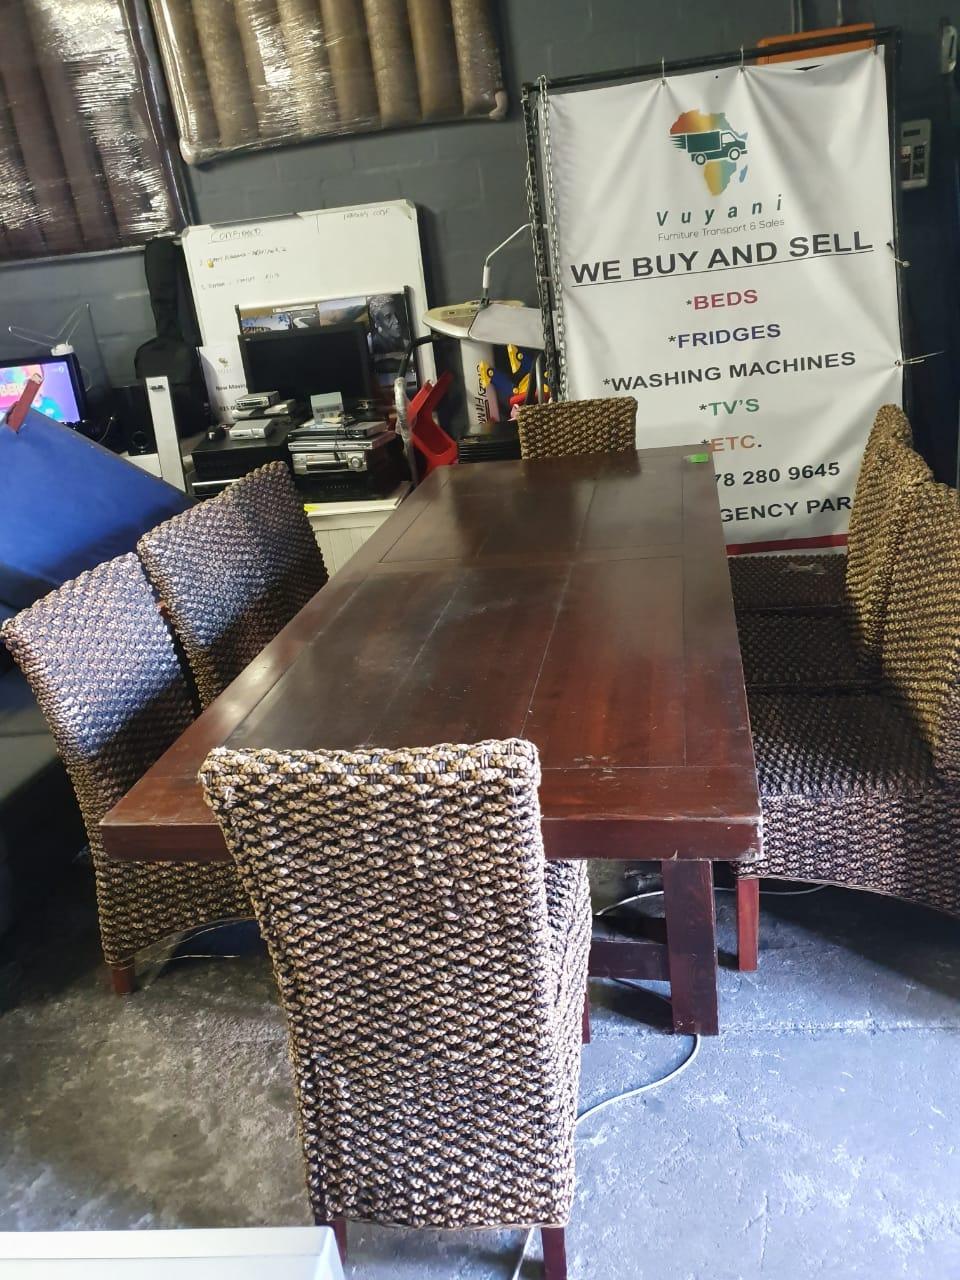 www.vuyanitrans.co.za/articles/selling-used-furniture